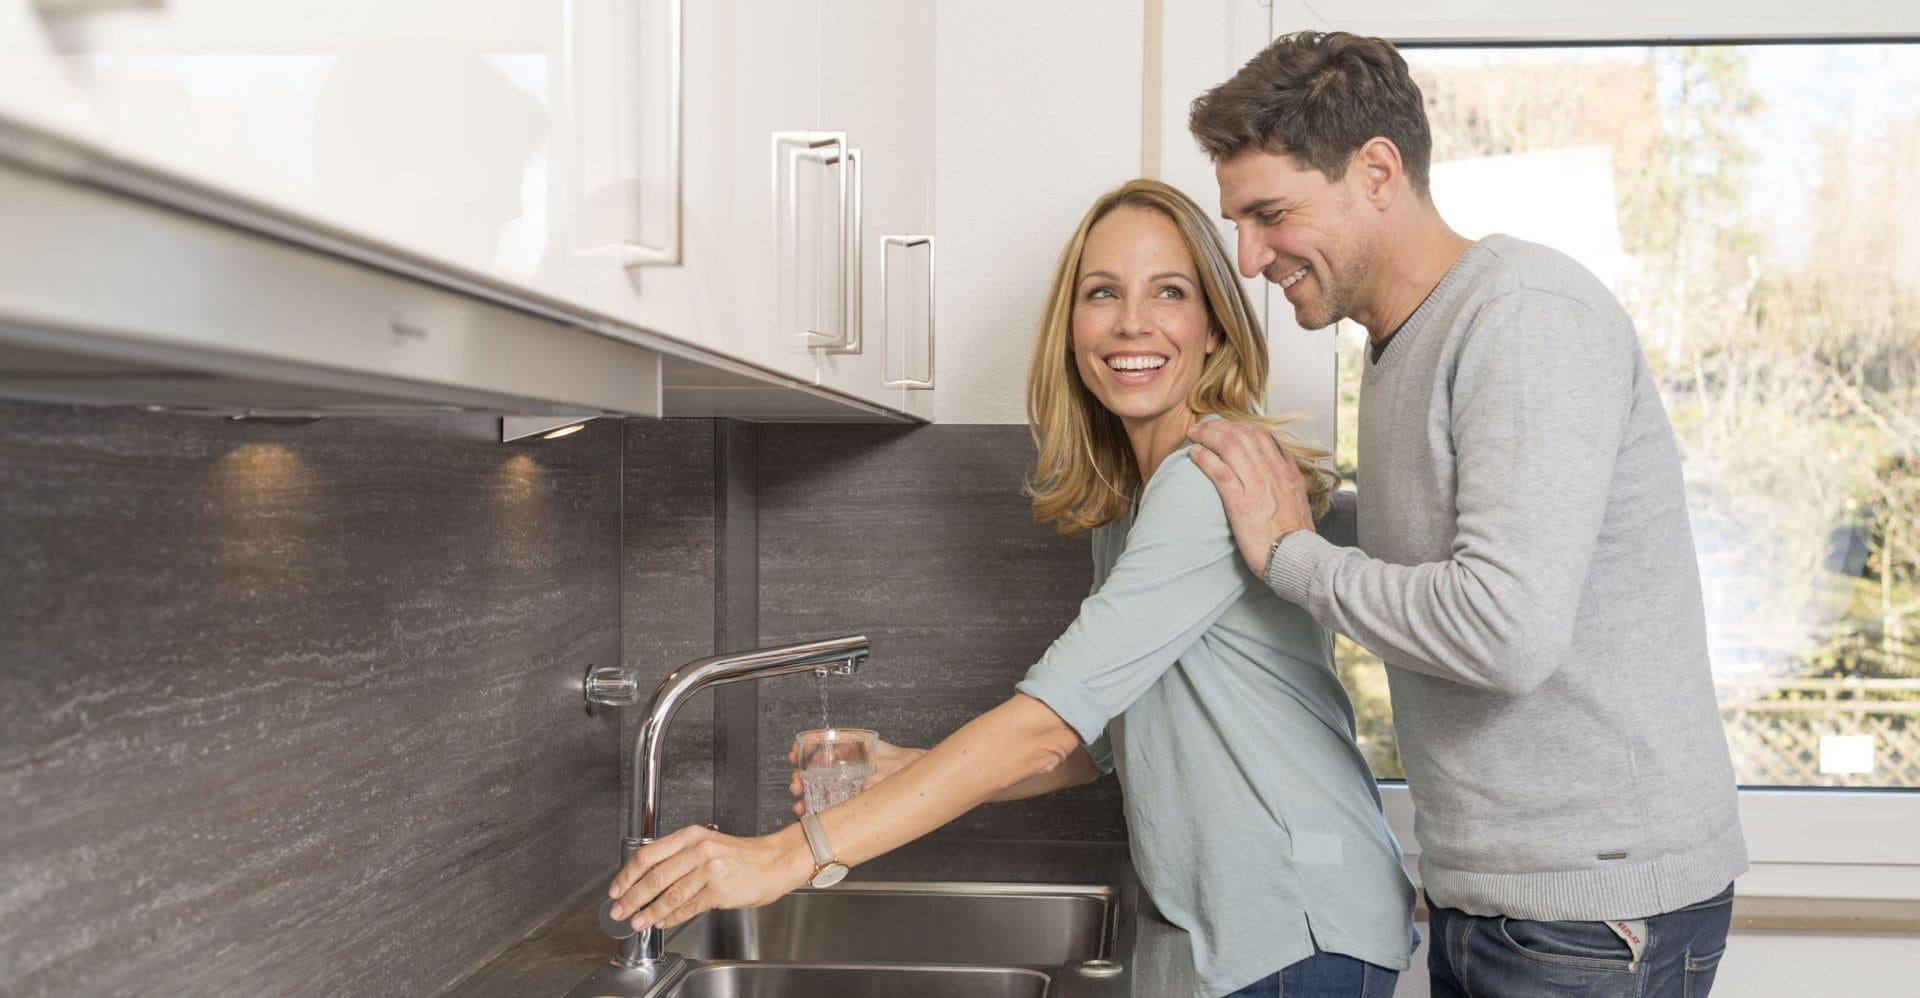 perma-trade permatrade Küche Einbau vital premium und permaquell Mikroplastik Filter